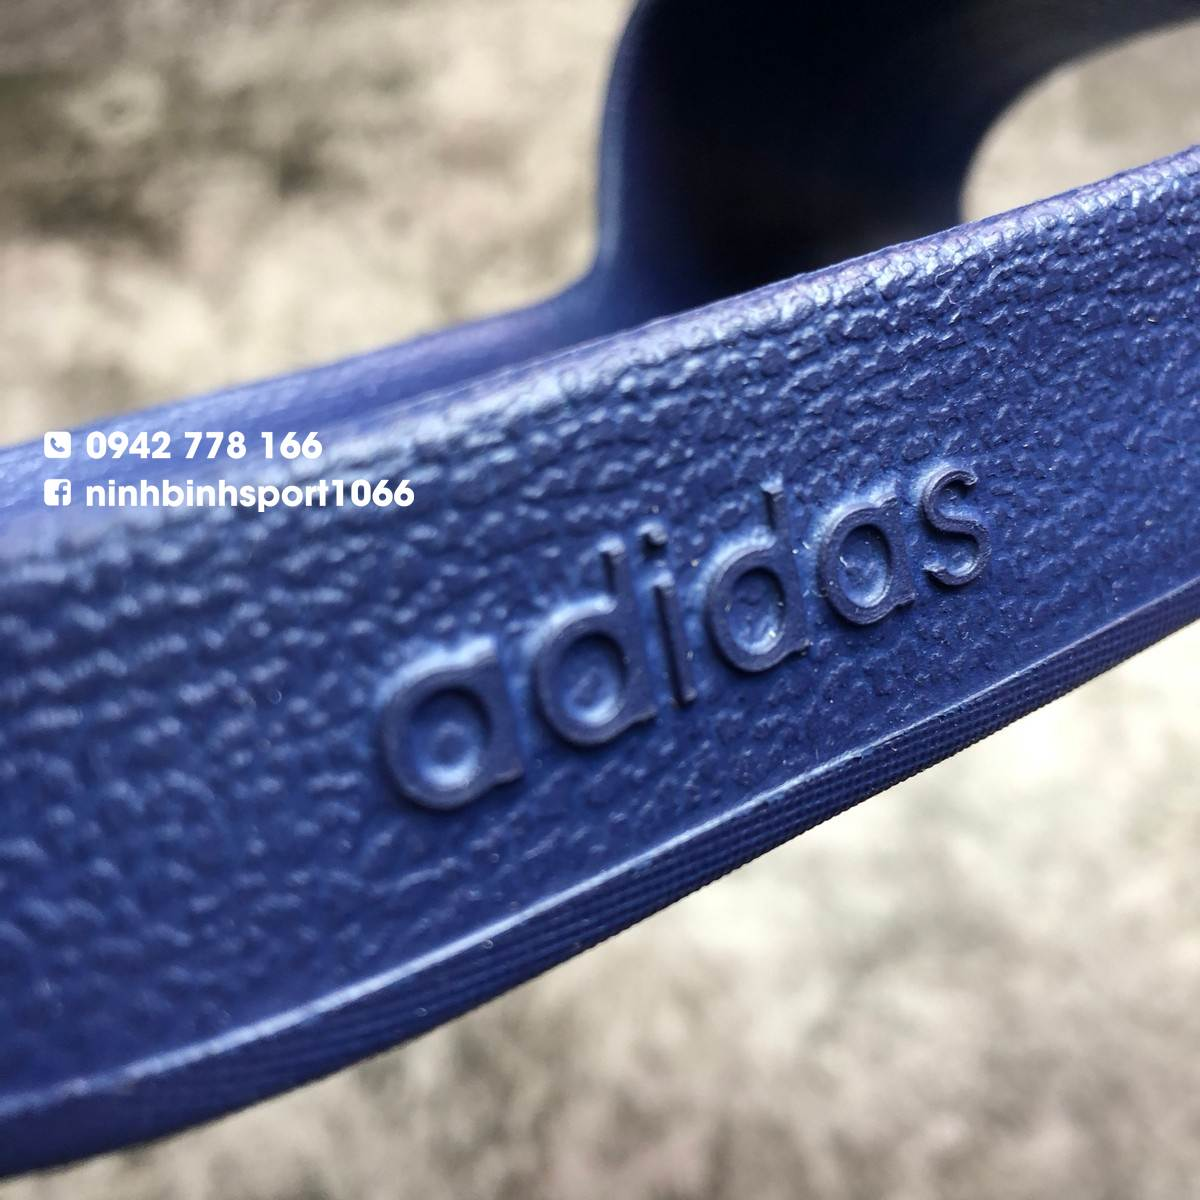 Dép thể thao nam Adidas Adilette Aqua Blue F35542